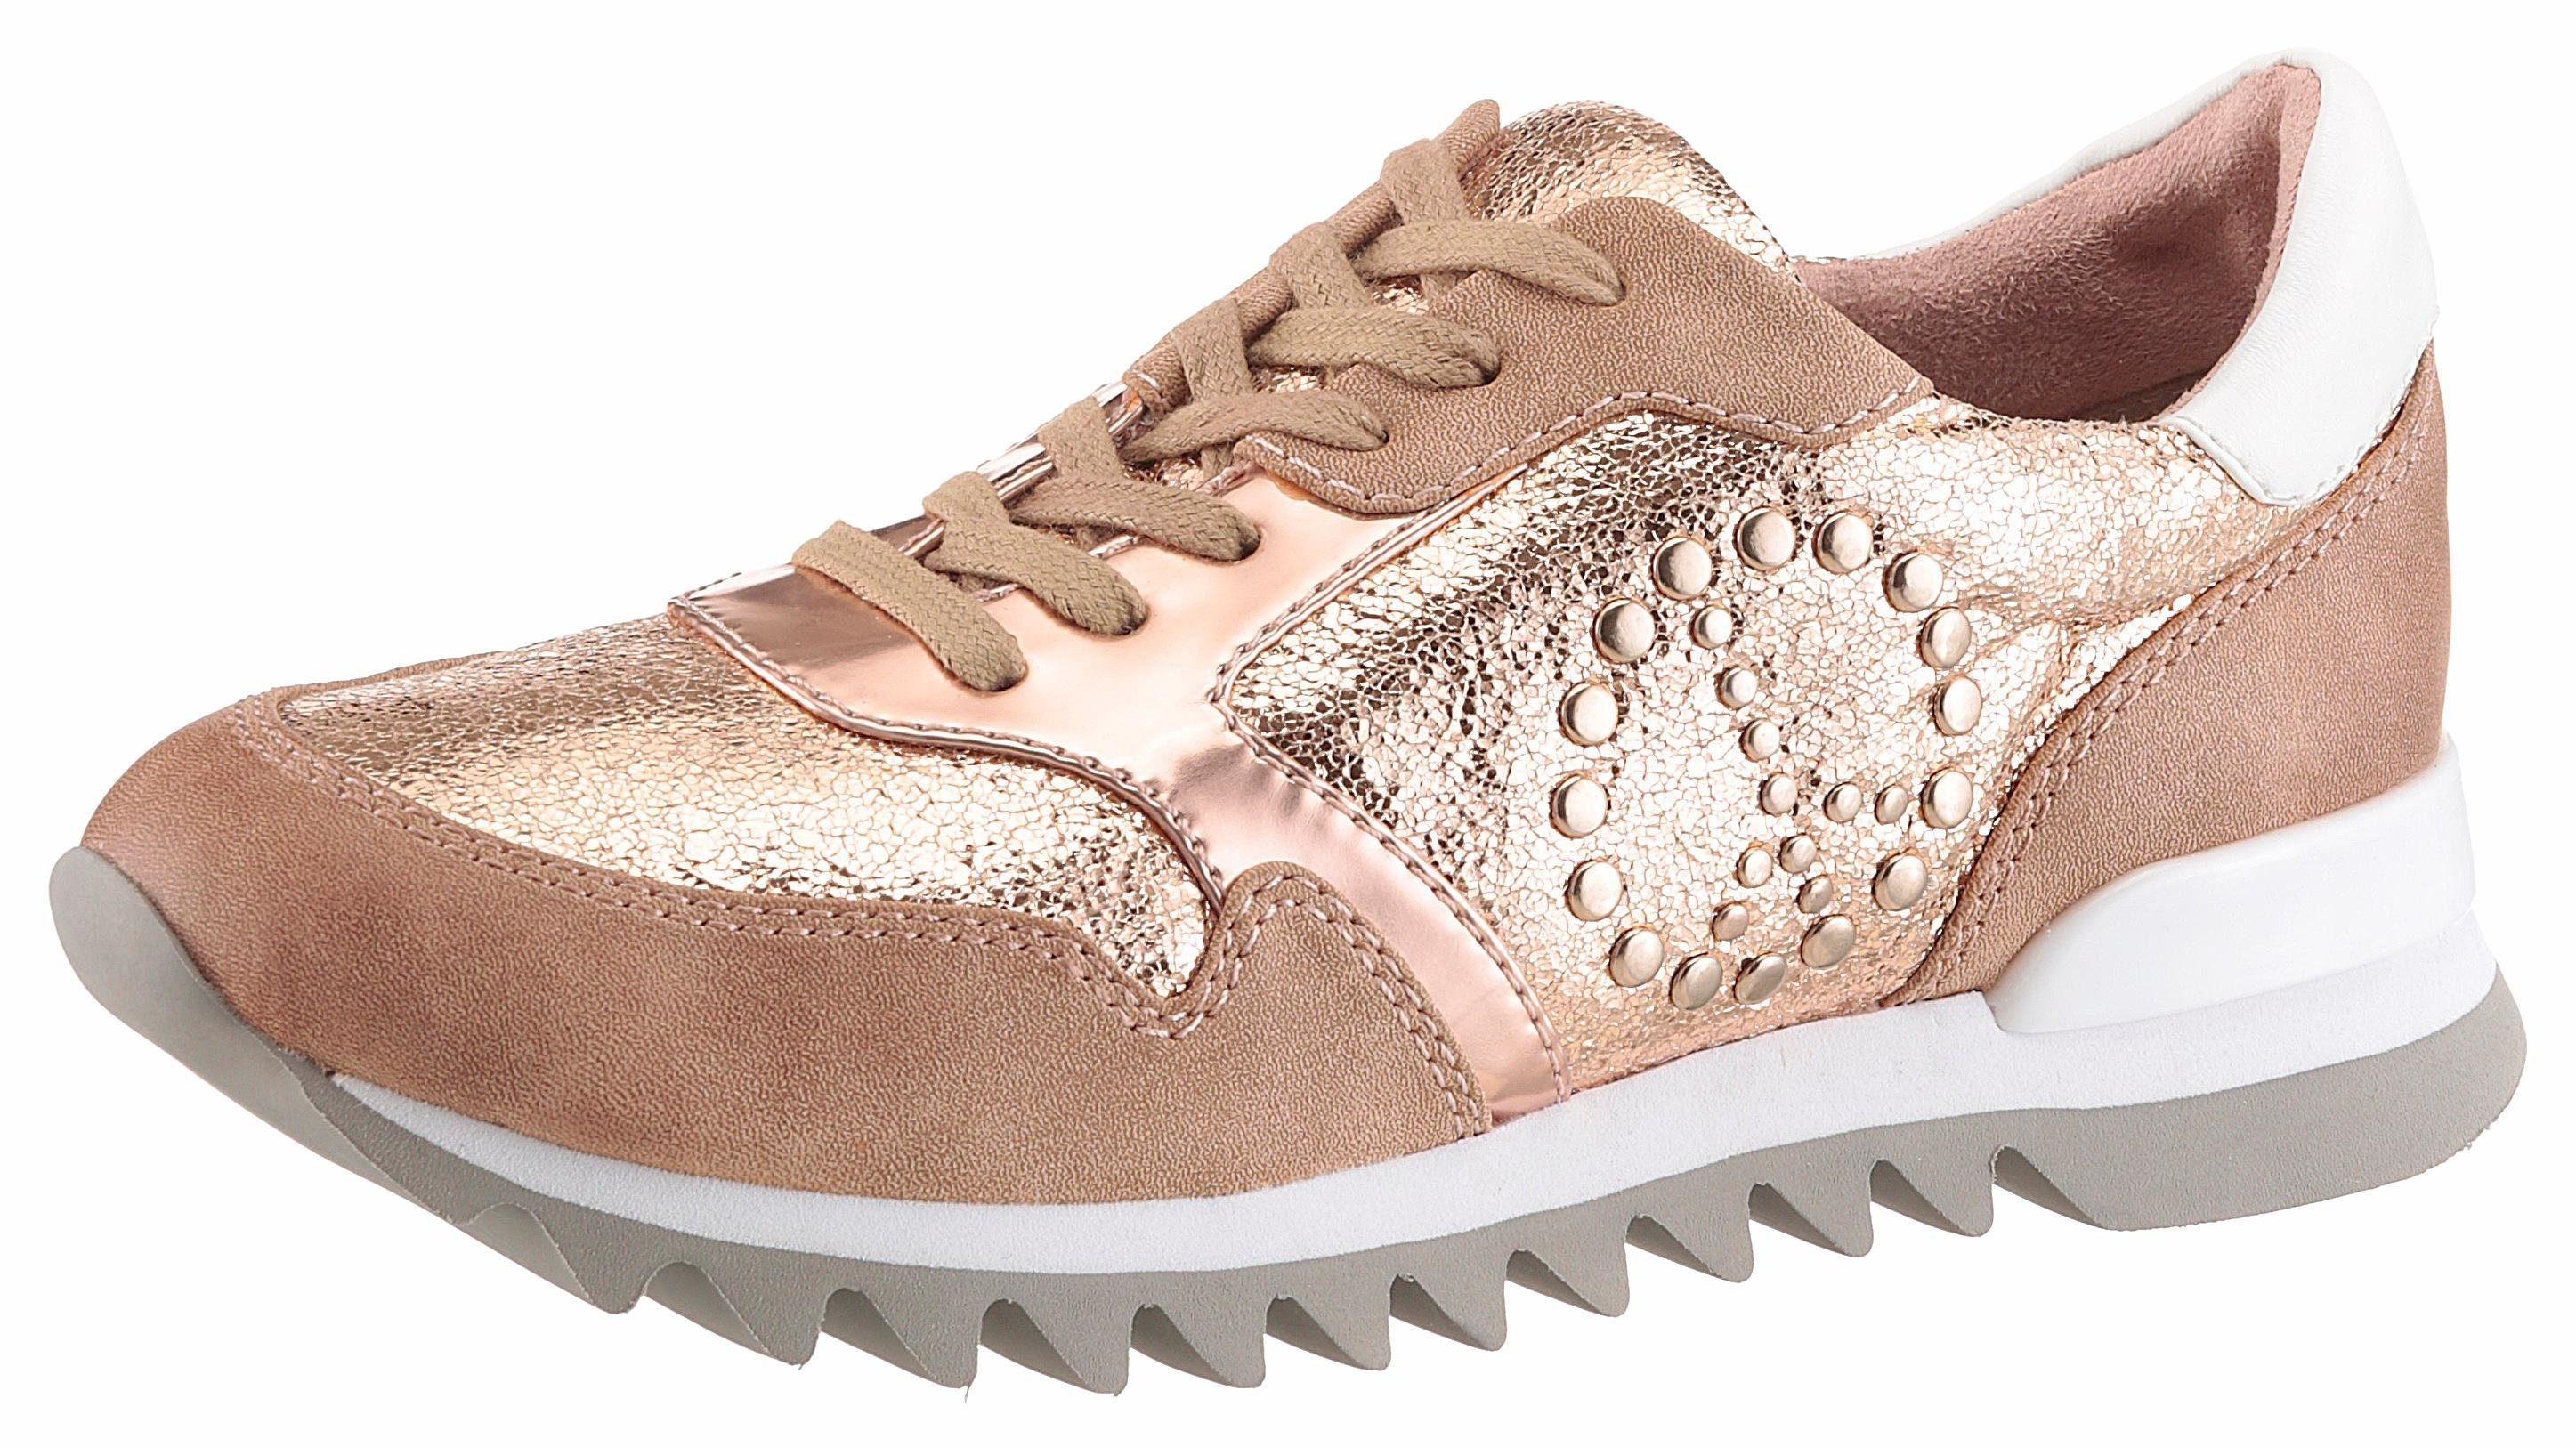 Tamaris Sneaker, mit trendiger Nietenverzierung  goldfarben-altrosa